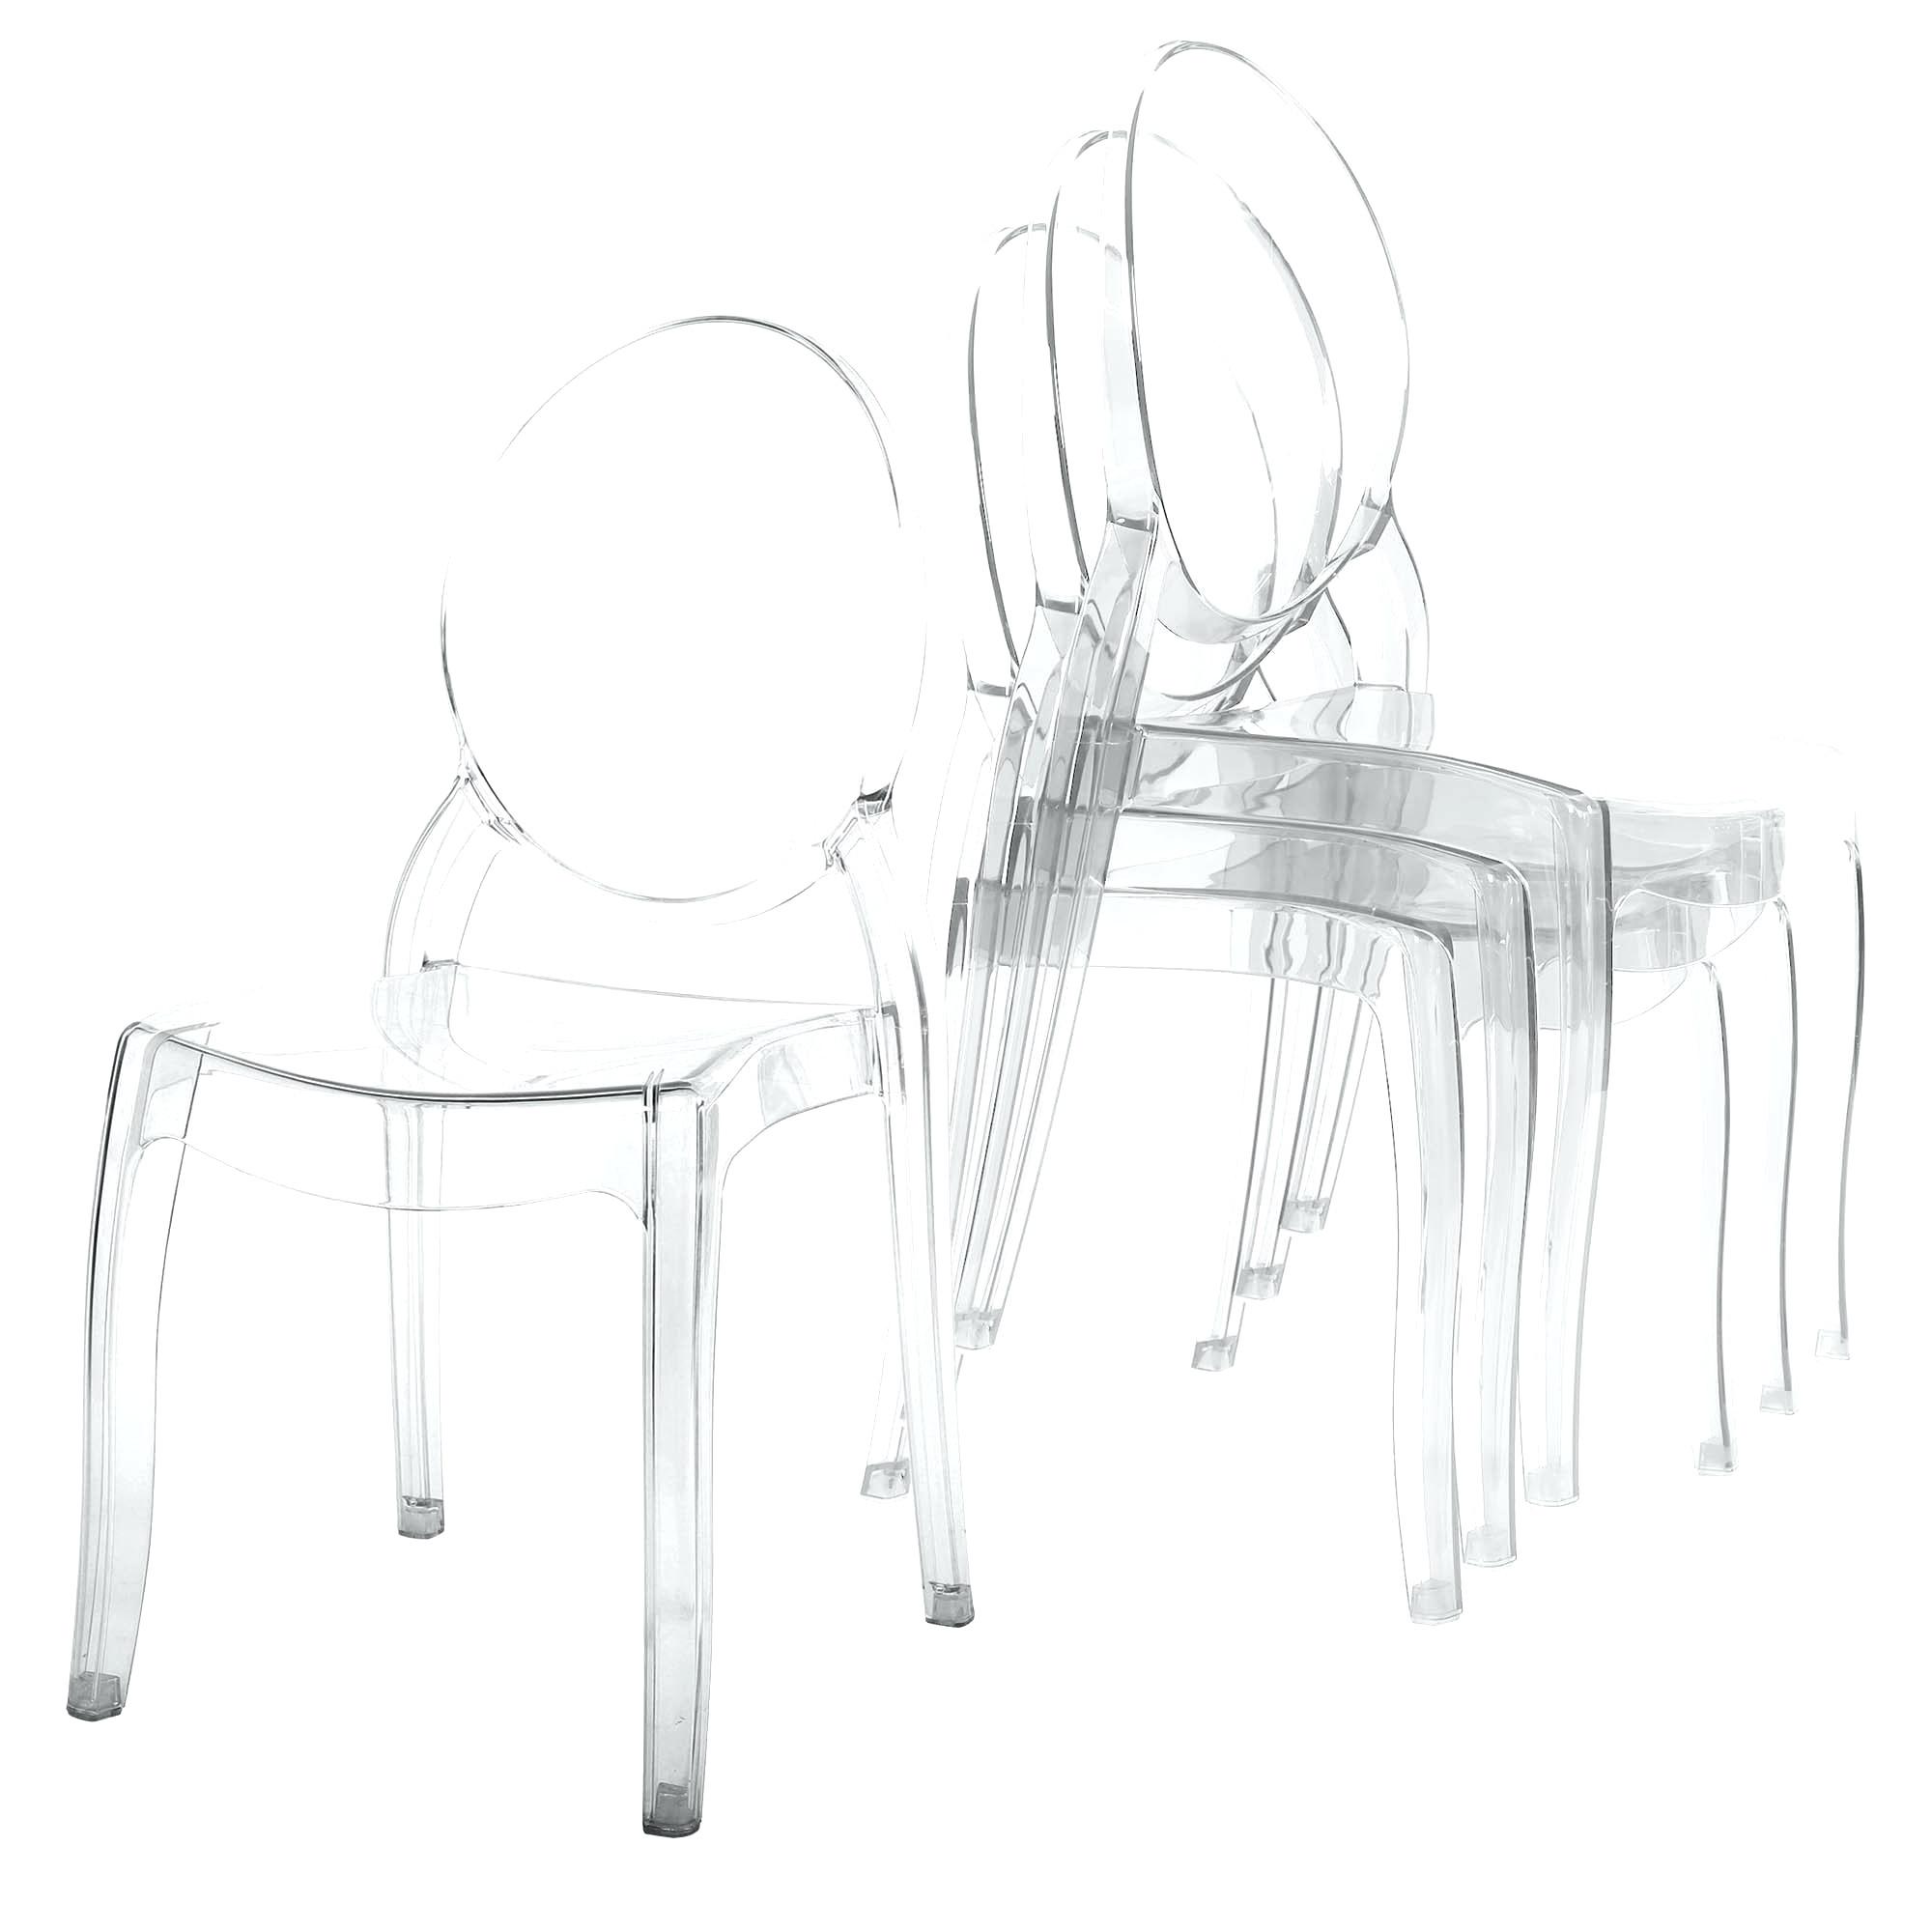 Plexiglass Blanc Leroy Merlin pour Salon De Jardin Fer Forgé Leroy Merlin